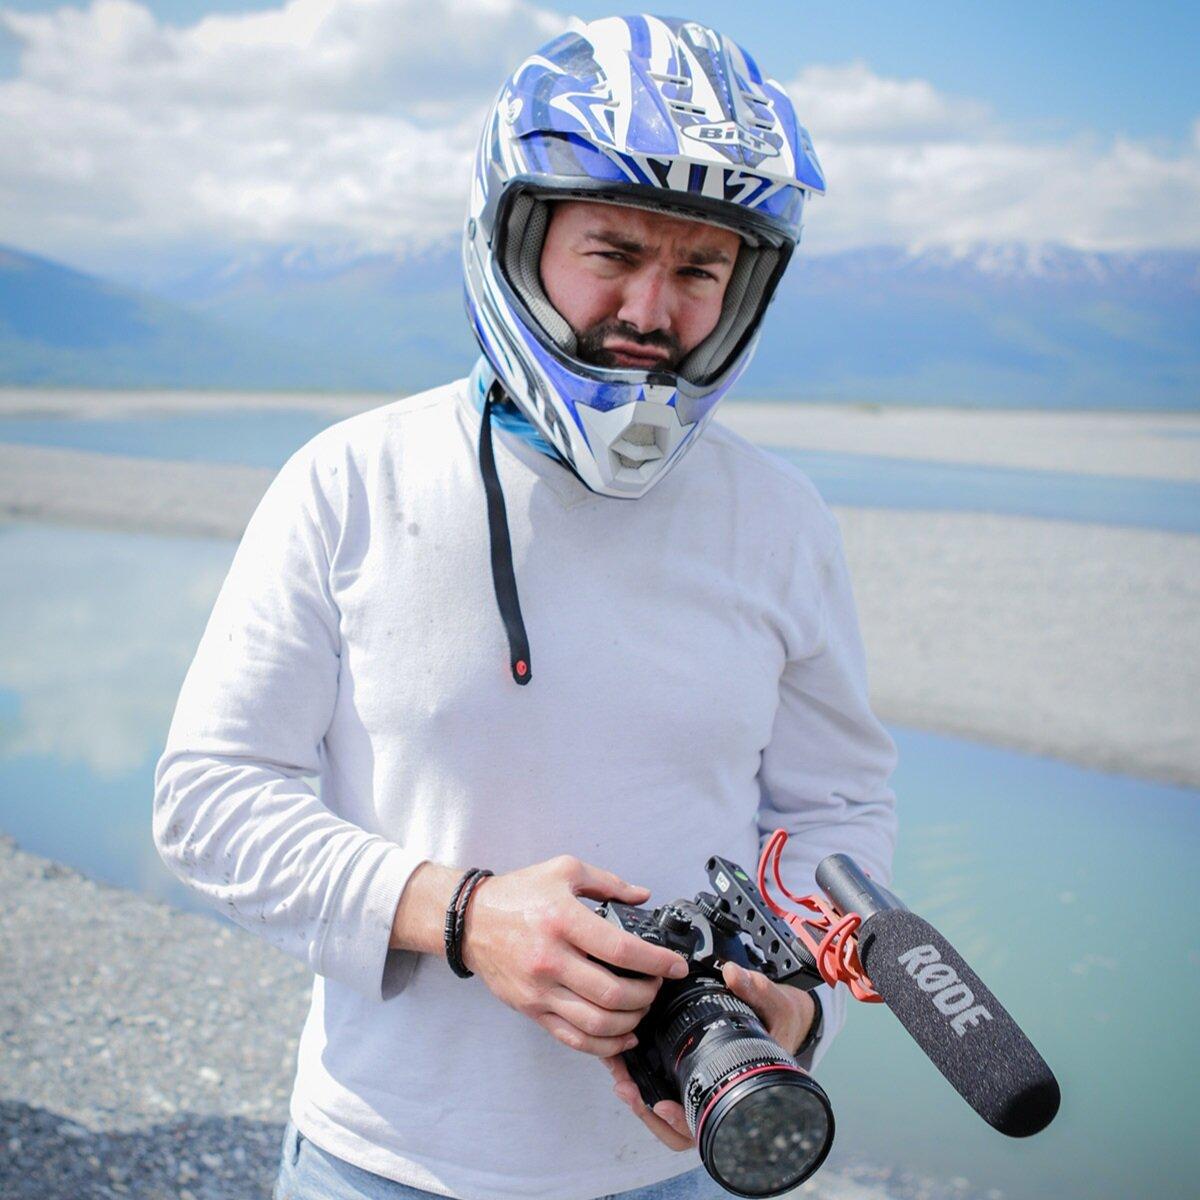 dan-redfield-alaska-photoventures-adventure-photographer-anchorage-based-3.jpg